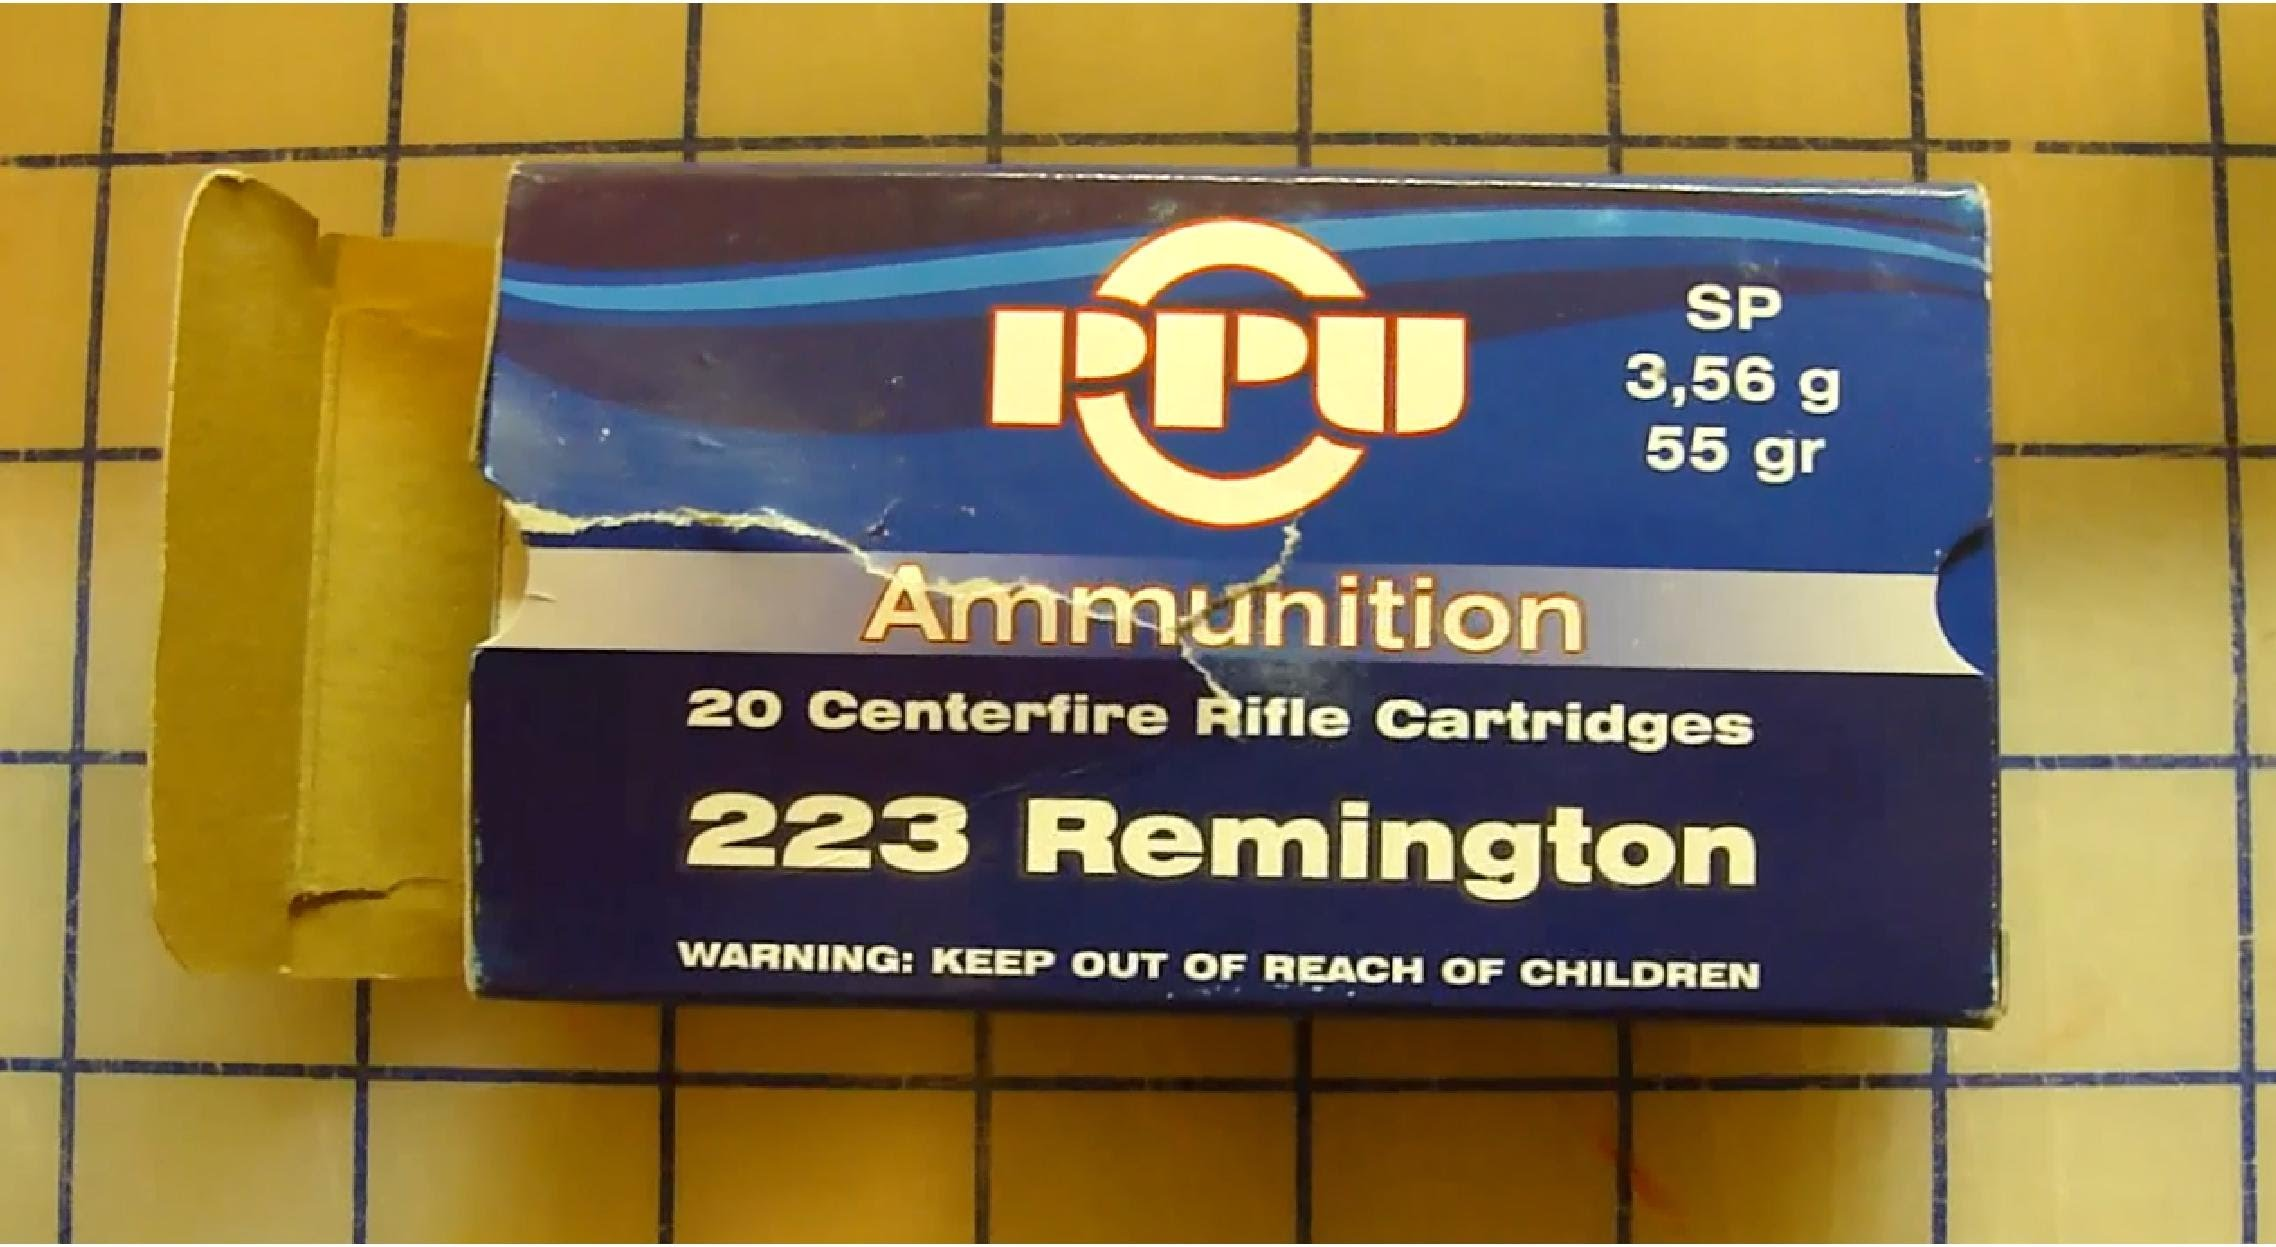 PPU .223 Rem 55 gr Soft Point Ballistic Gel Test